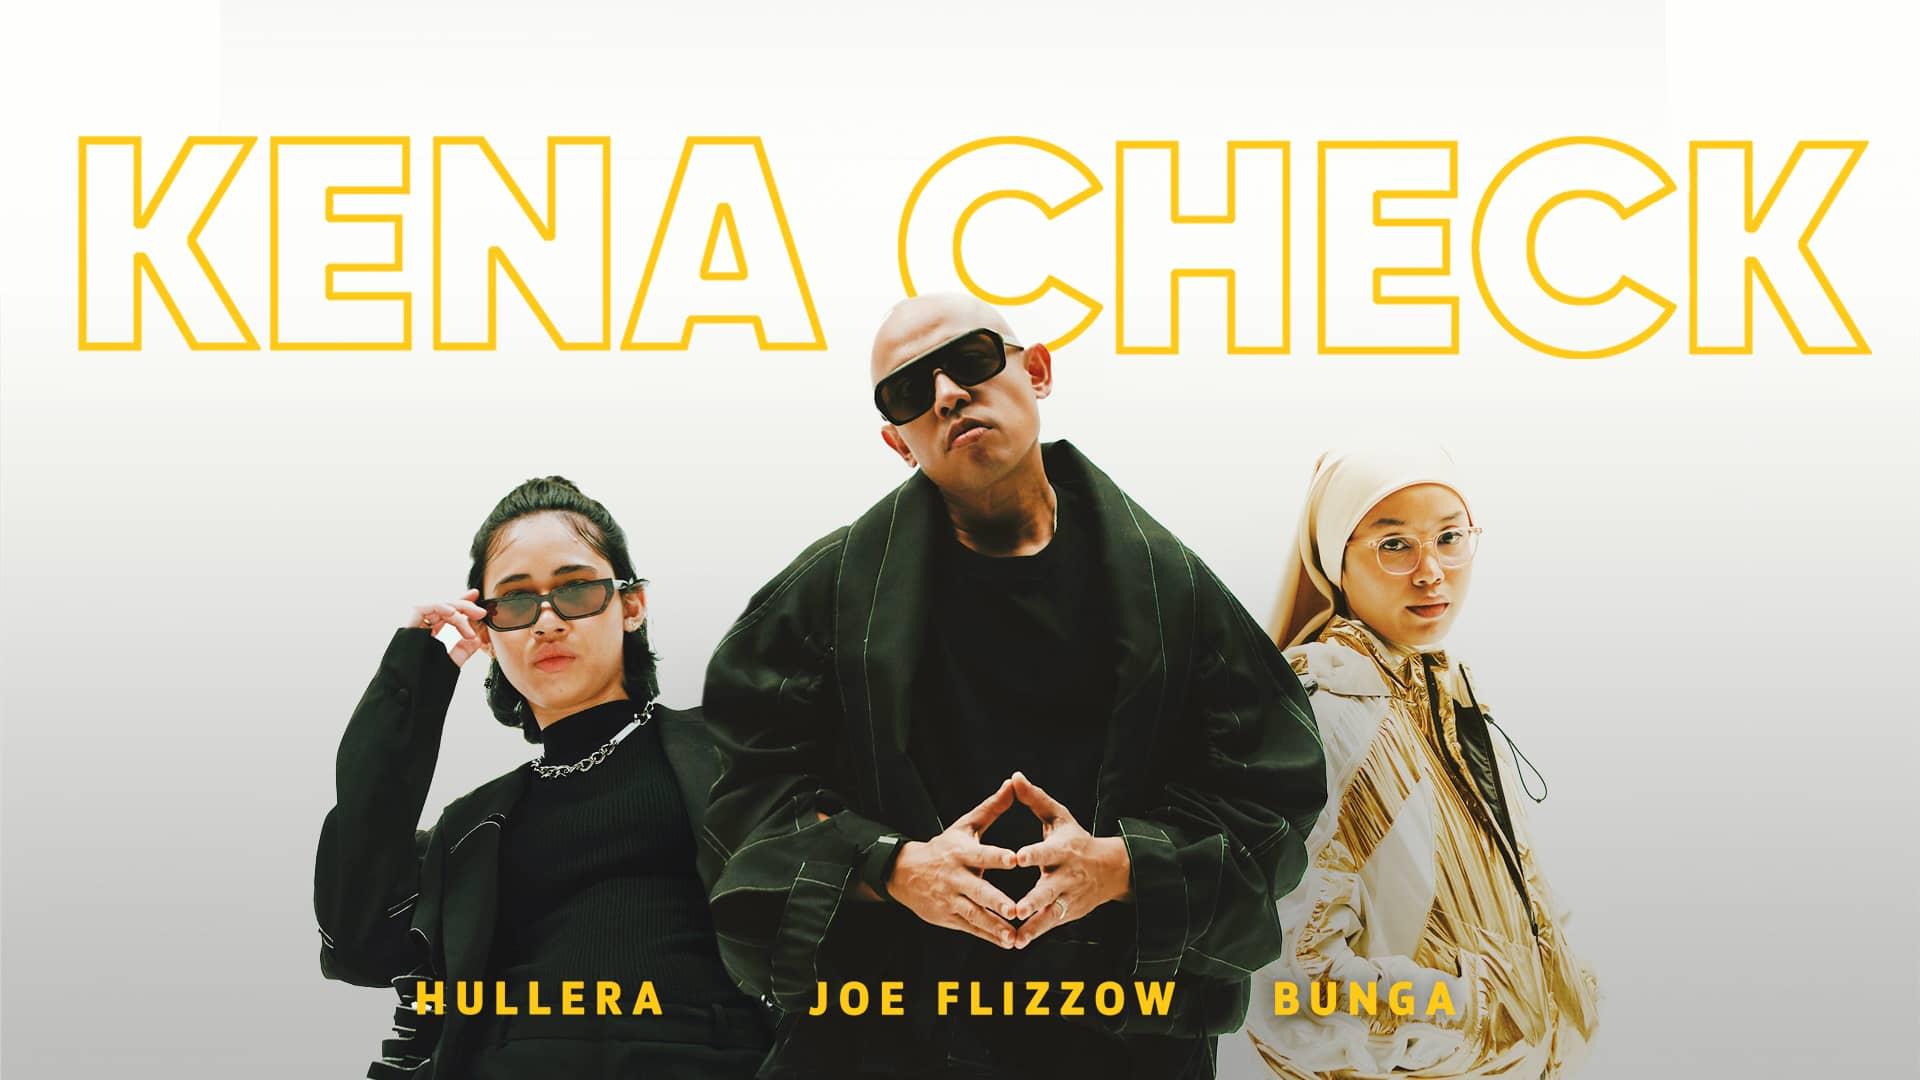 realme Malaysia Releases 'Kena Check' By realme 5G Ambassadors, Joe Flizzow, Hullera And Bunga